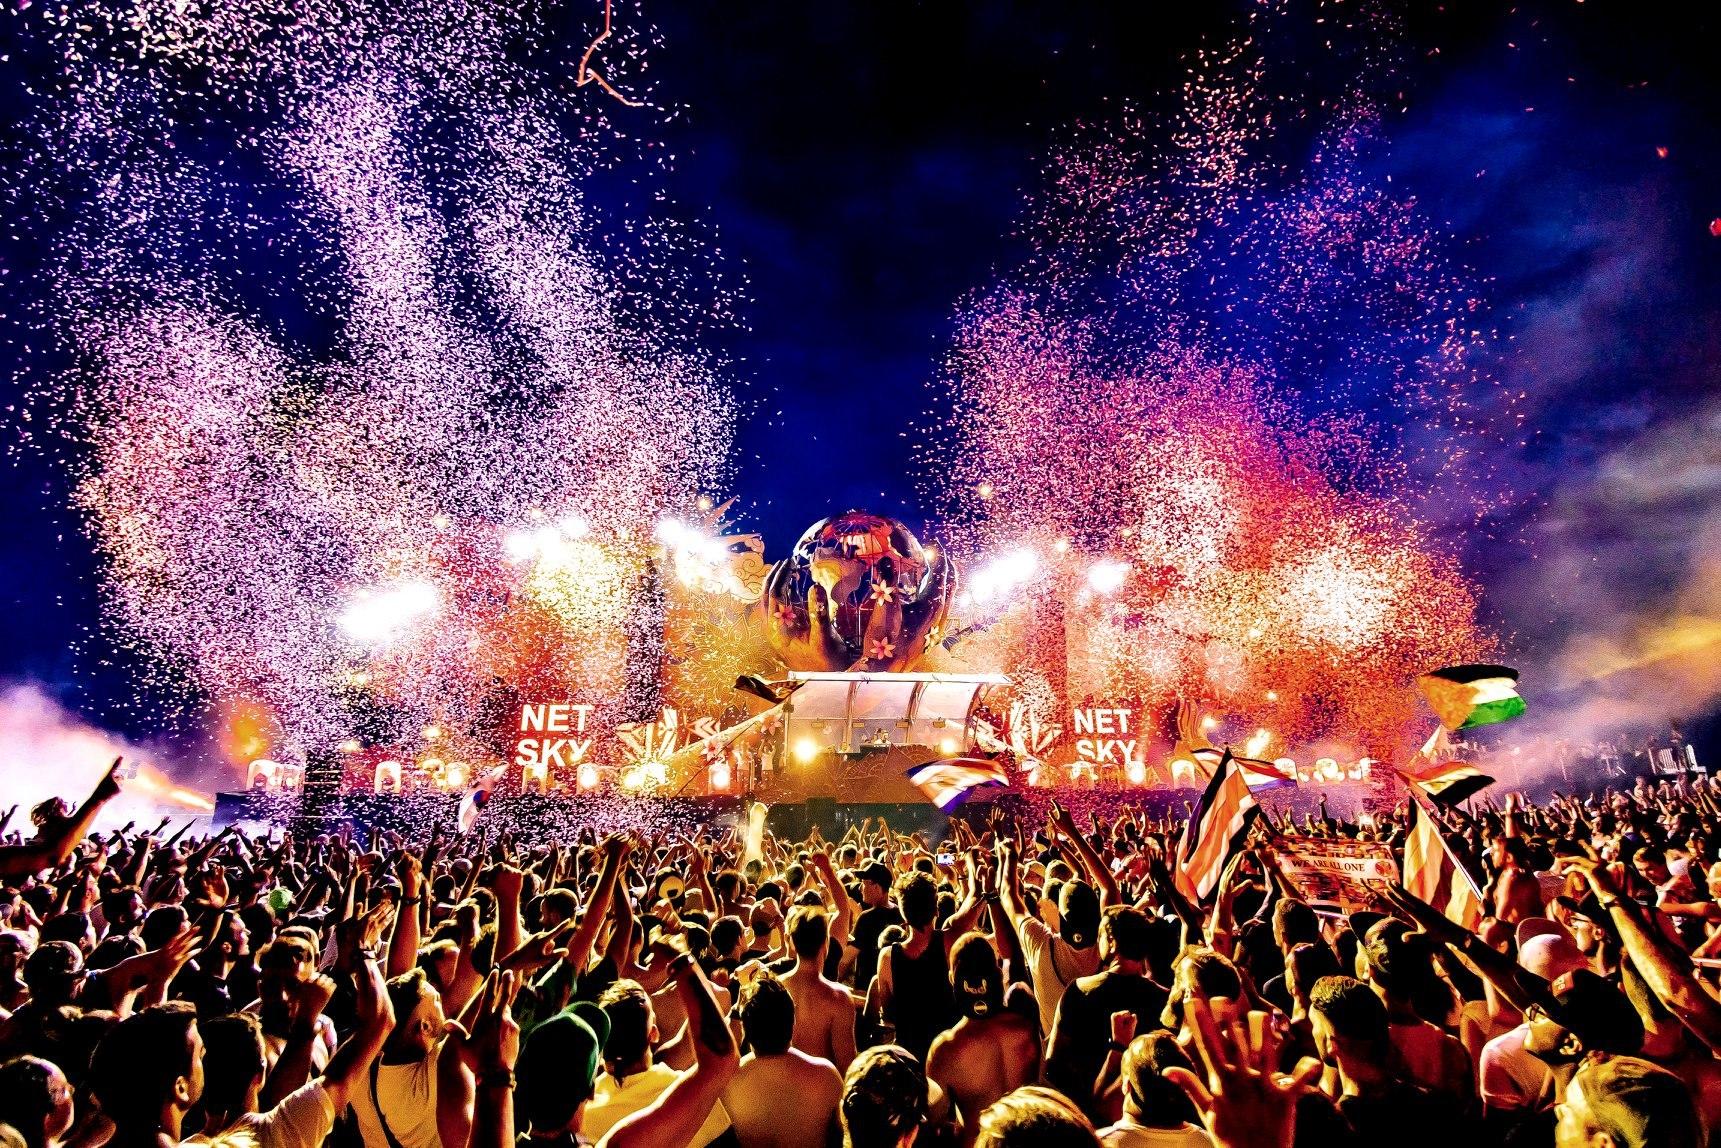 Netsky Tomorrowland 2019